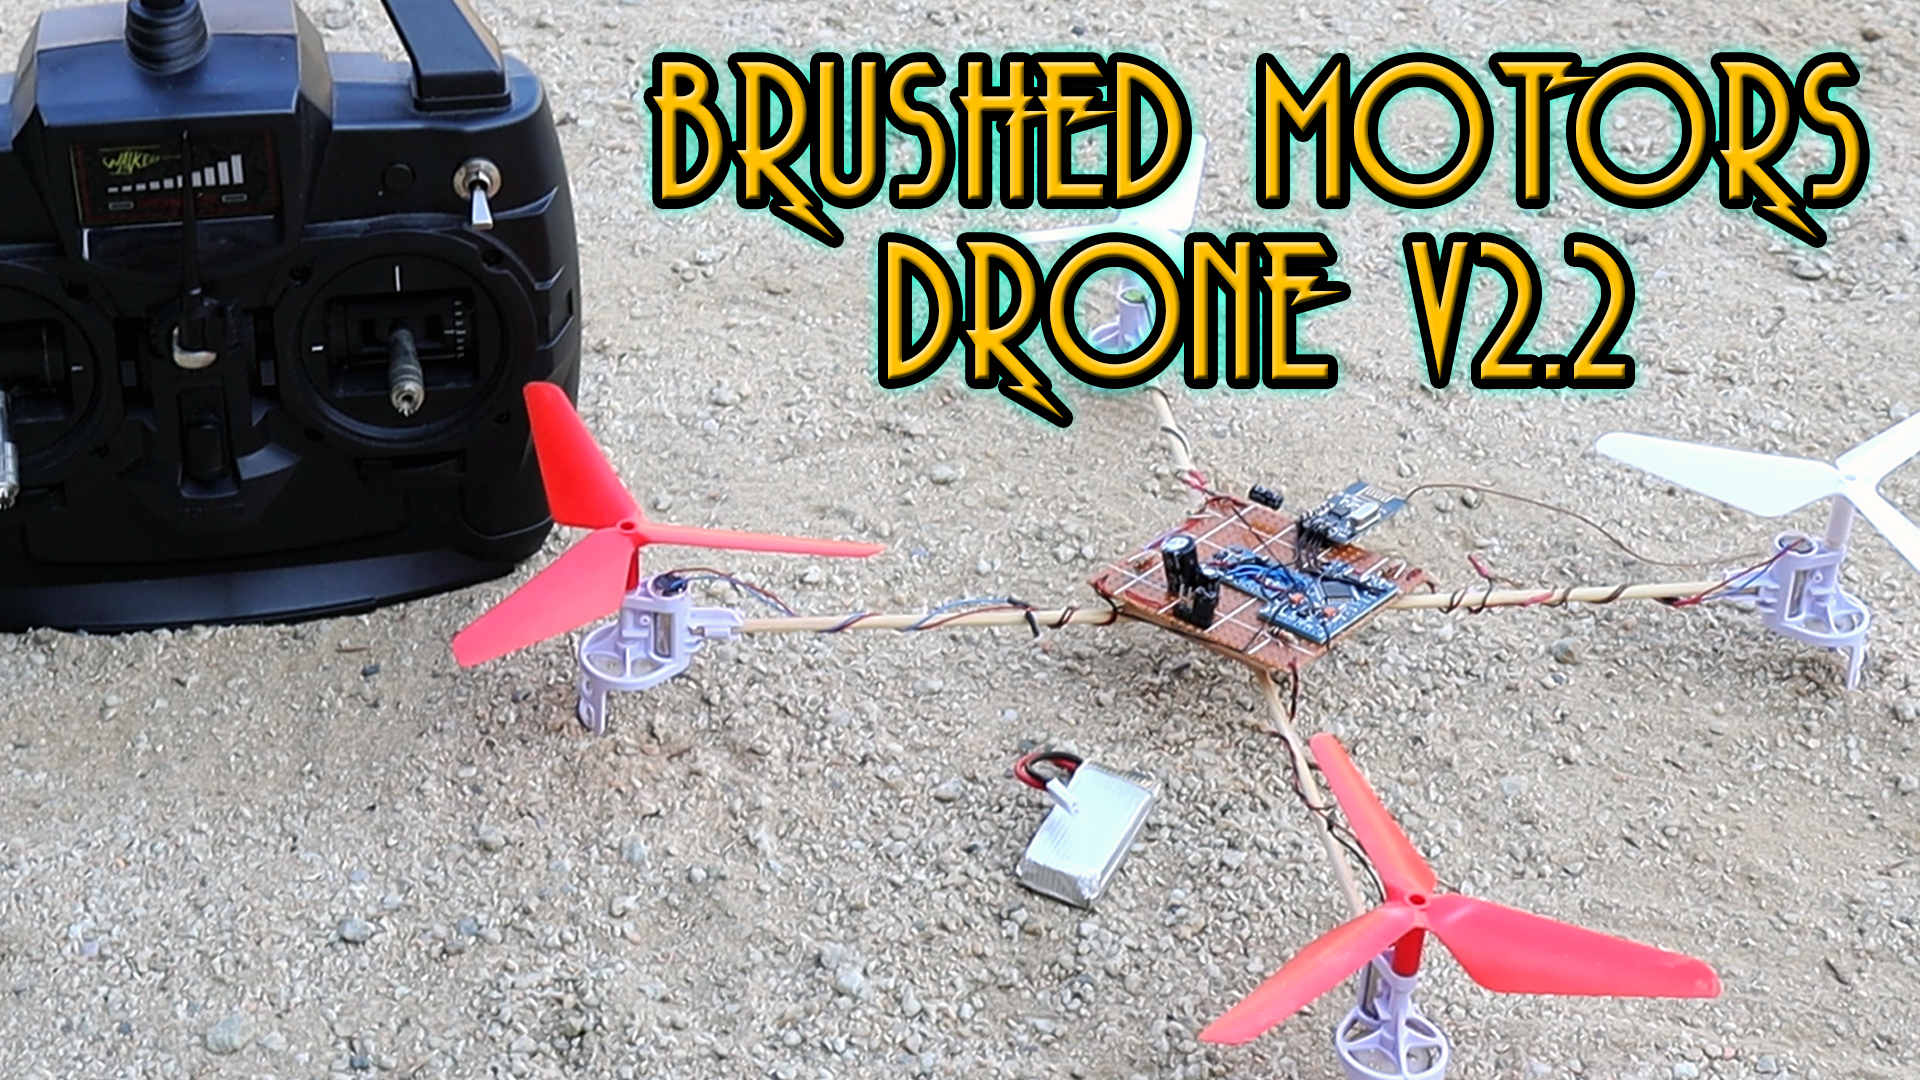 Brushed motors Arduino cheap homemade drone